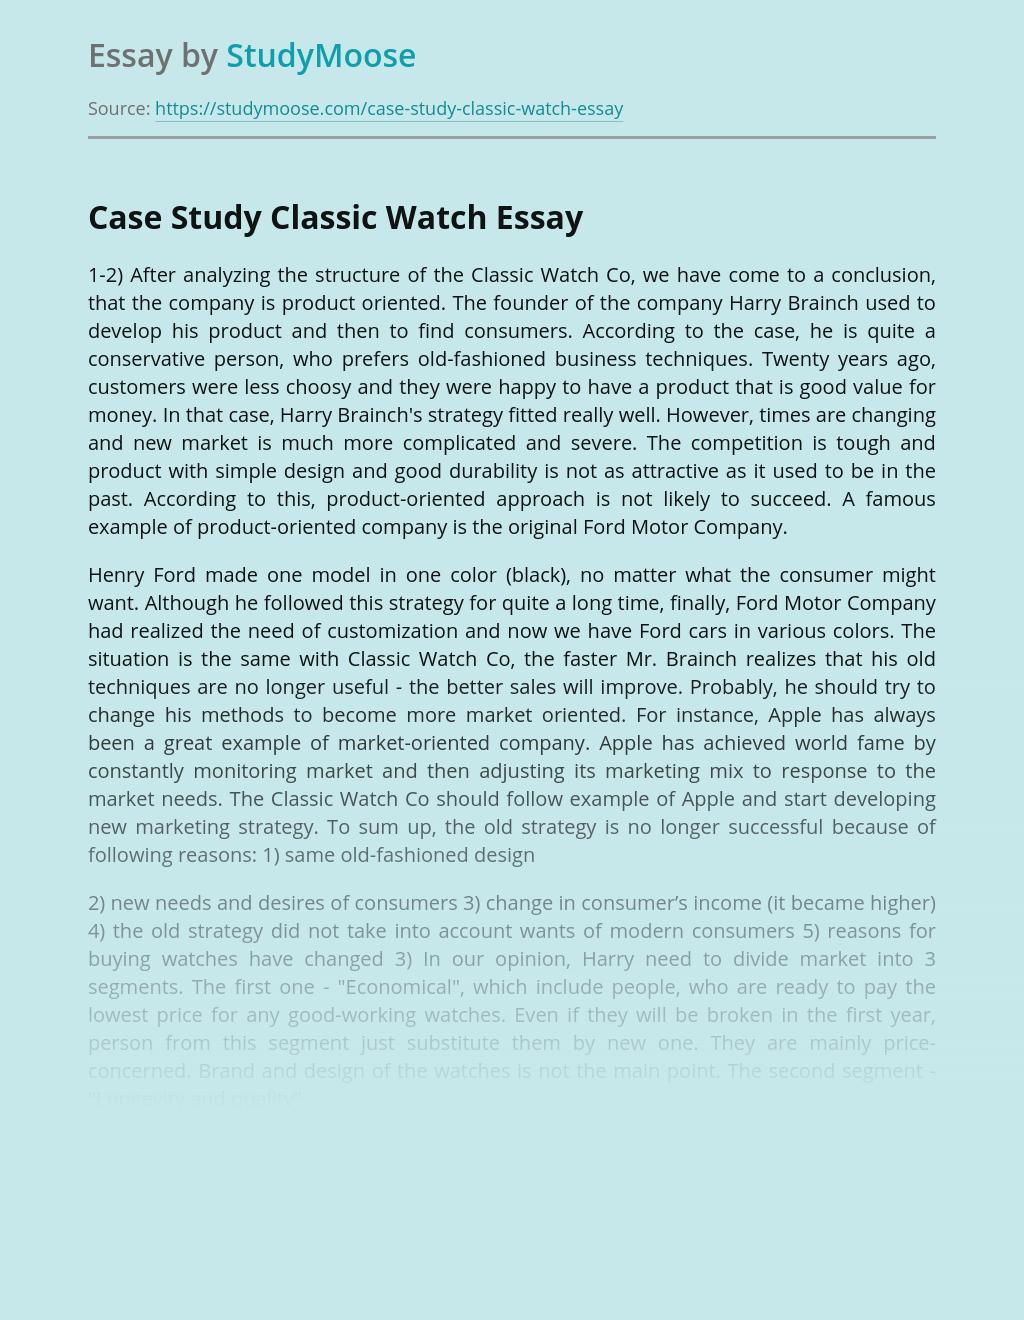 Case Study Classic Watch